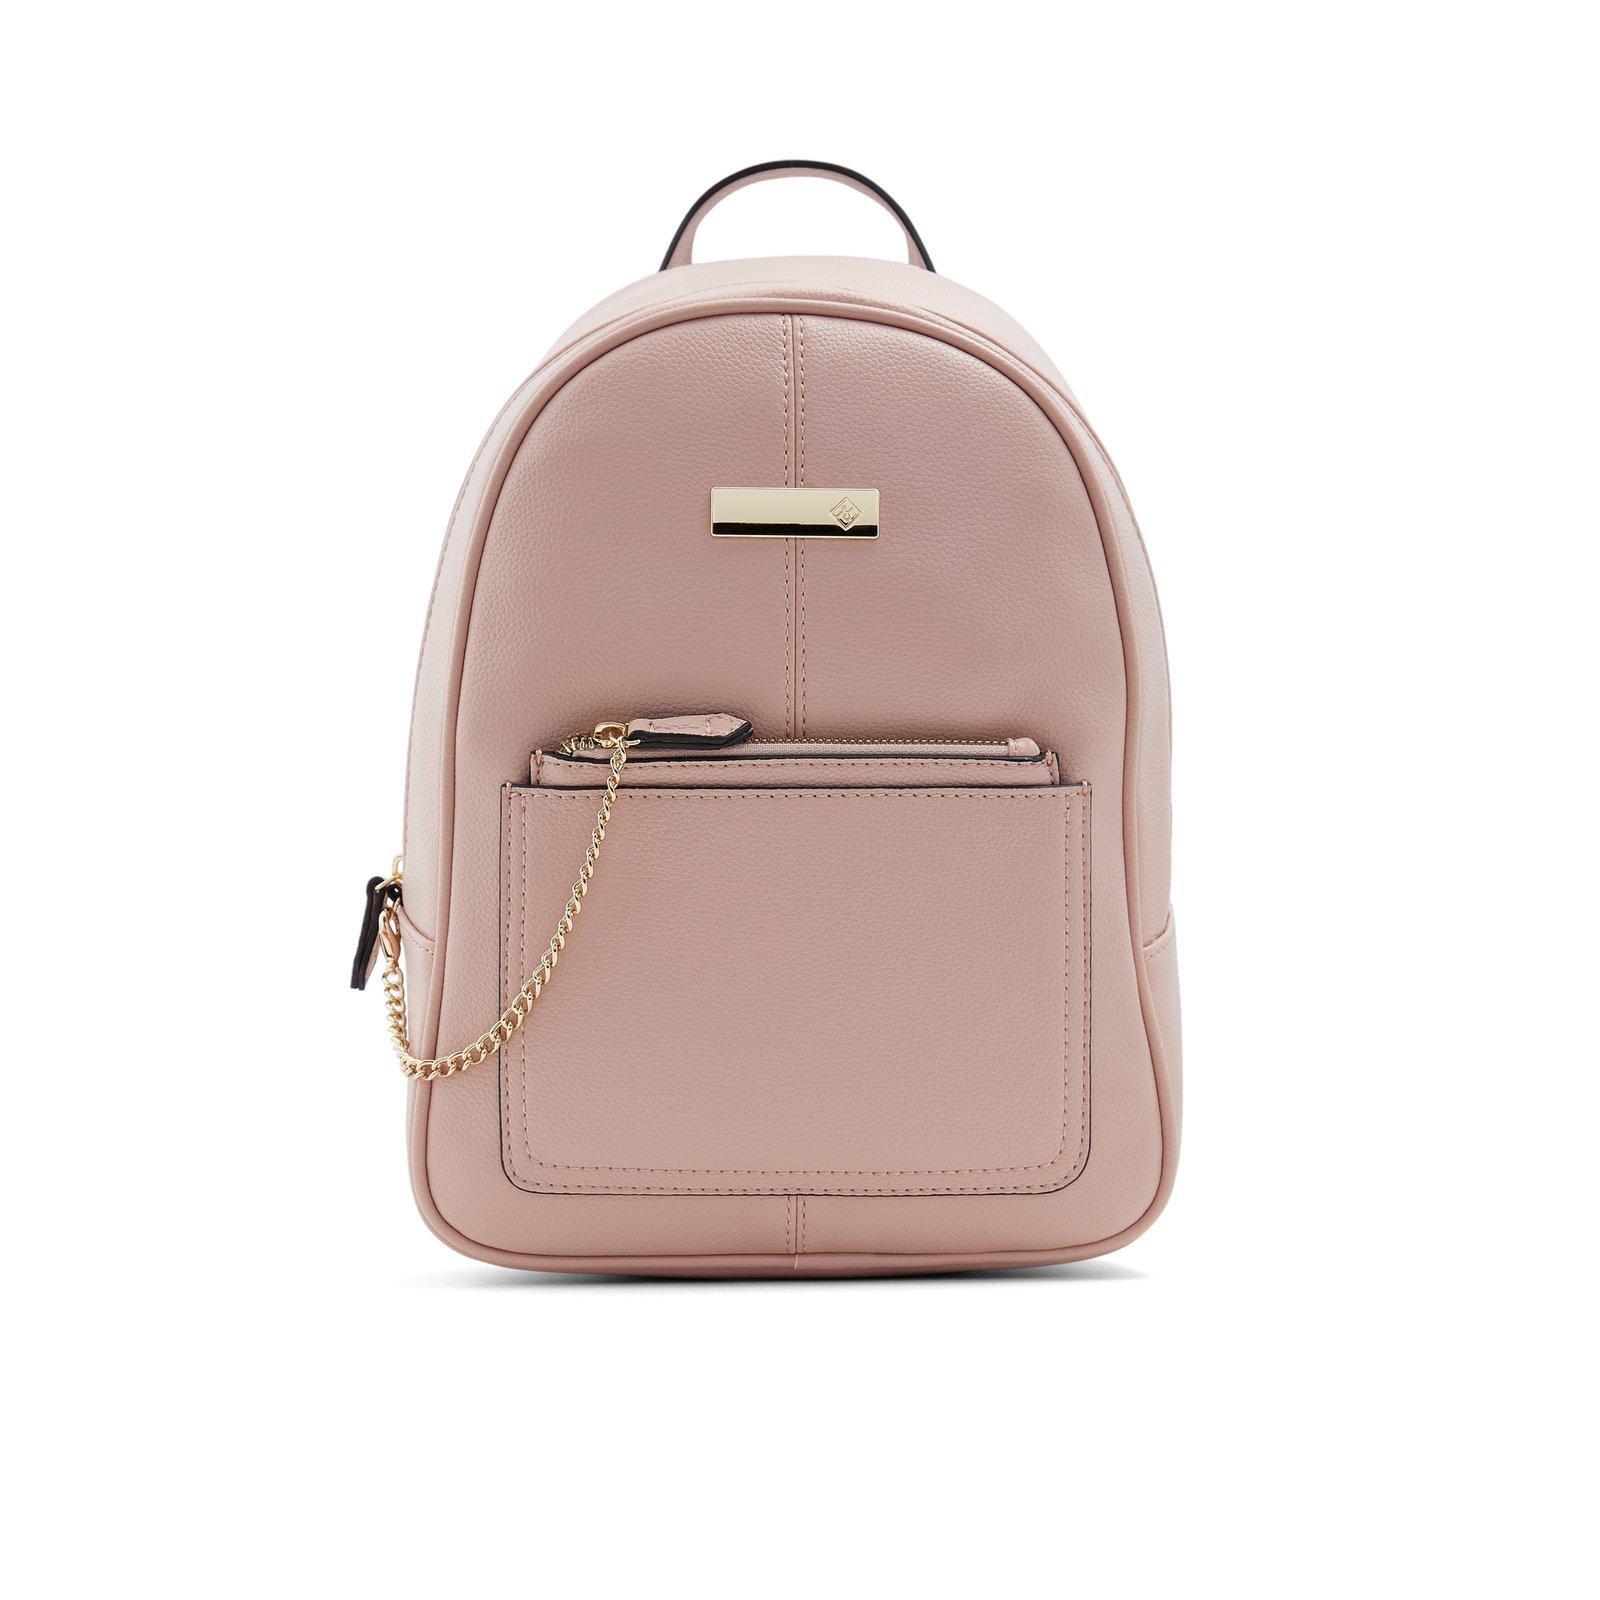 Call It Spring Dulyalbin - Women's Handbags - Pink photo